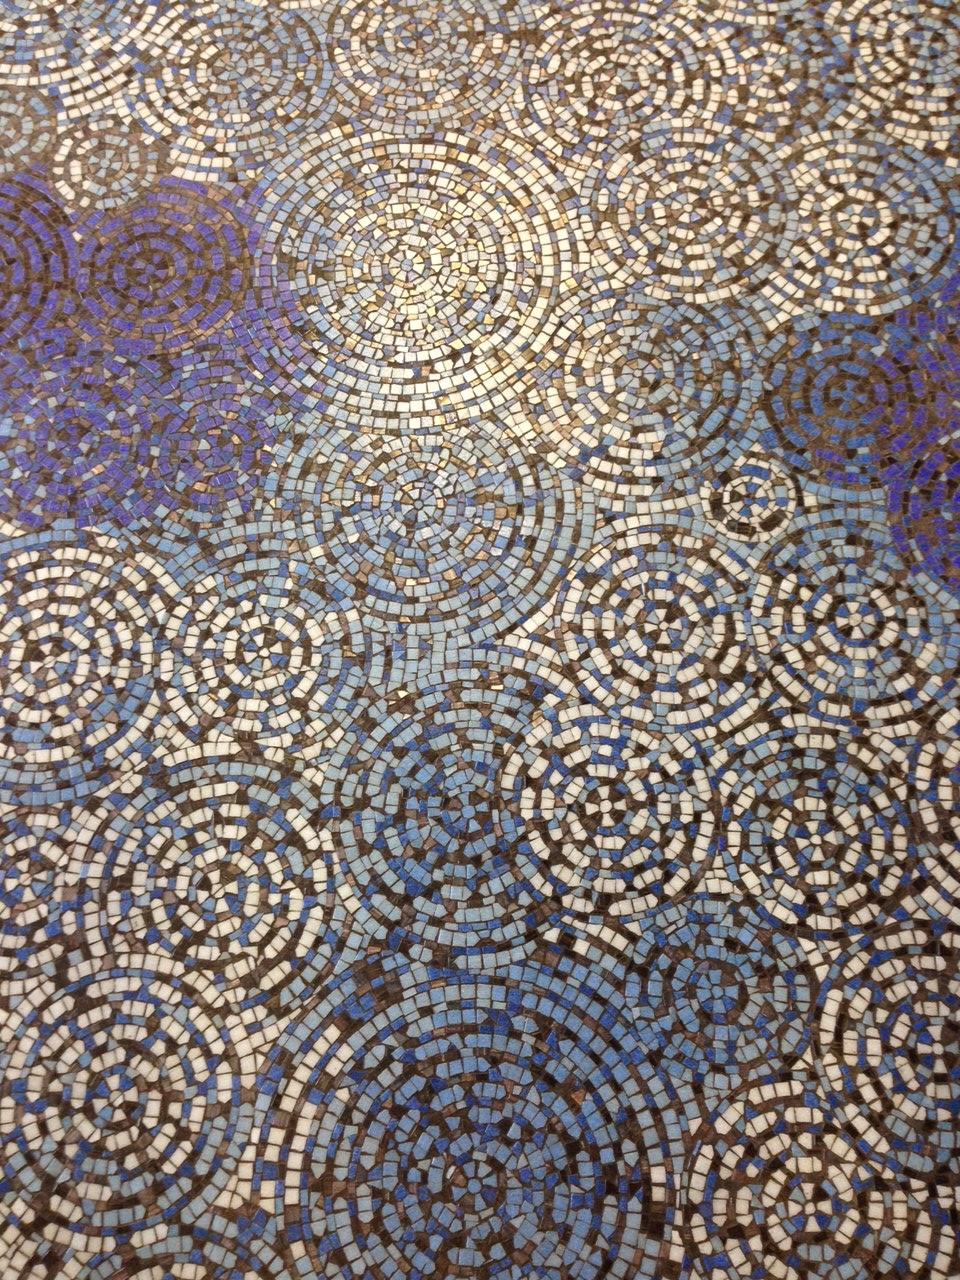 Laticrete australia conversations gorgeous mosaic art for Mosaic painting meaning